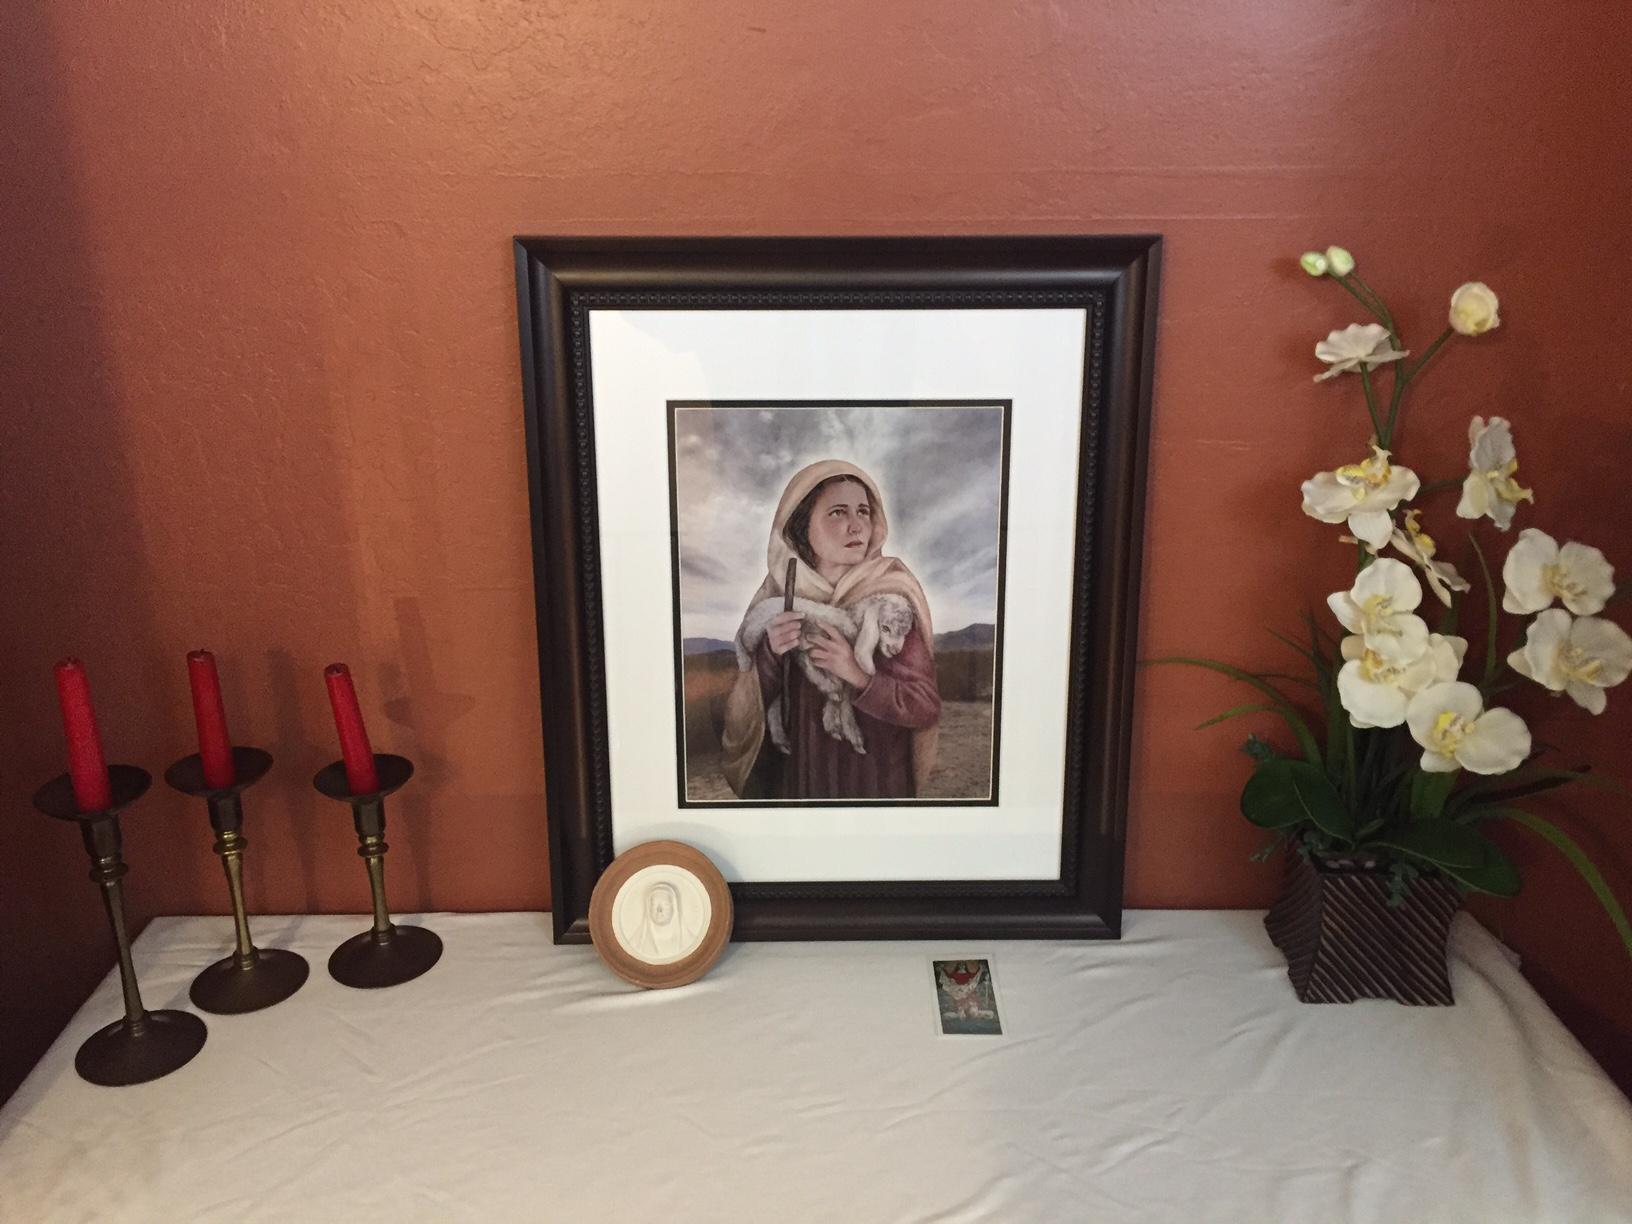 Saint Germaine Exhibit 2